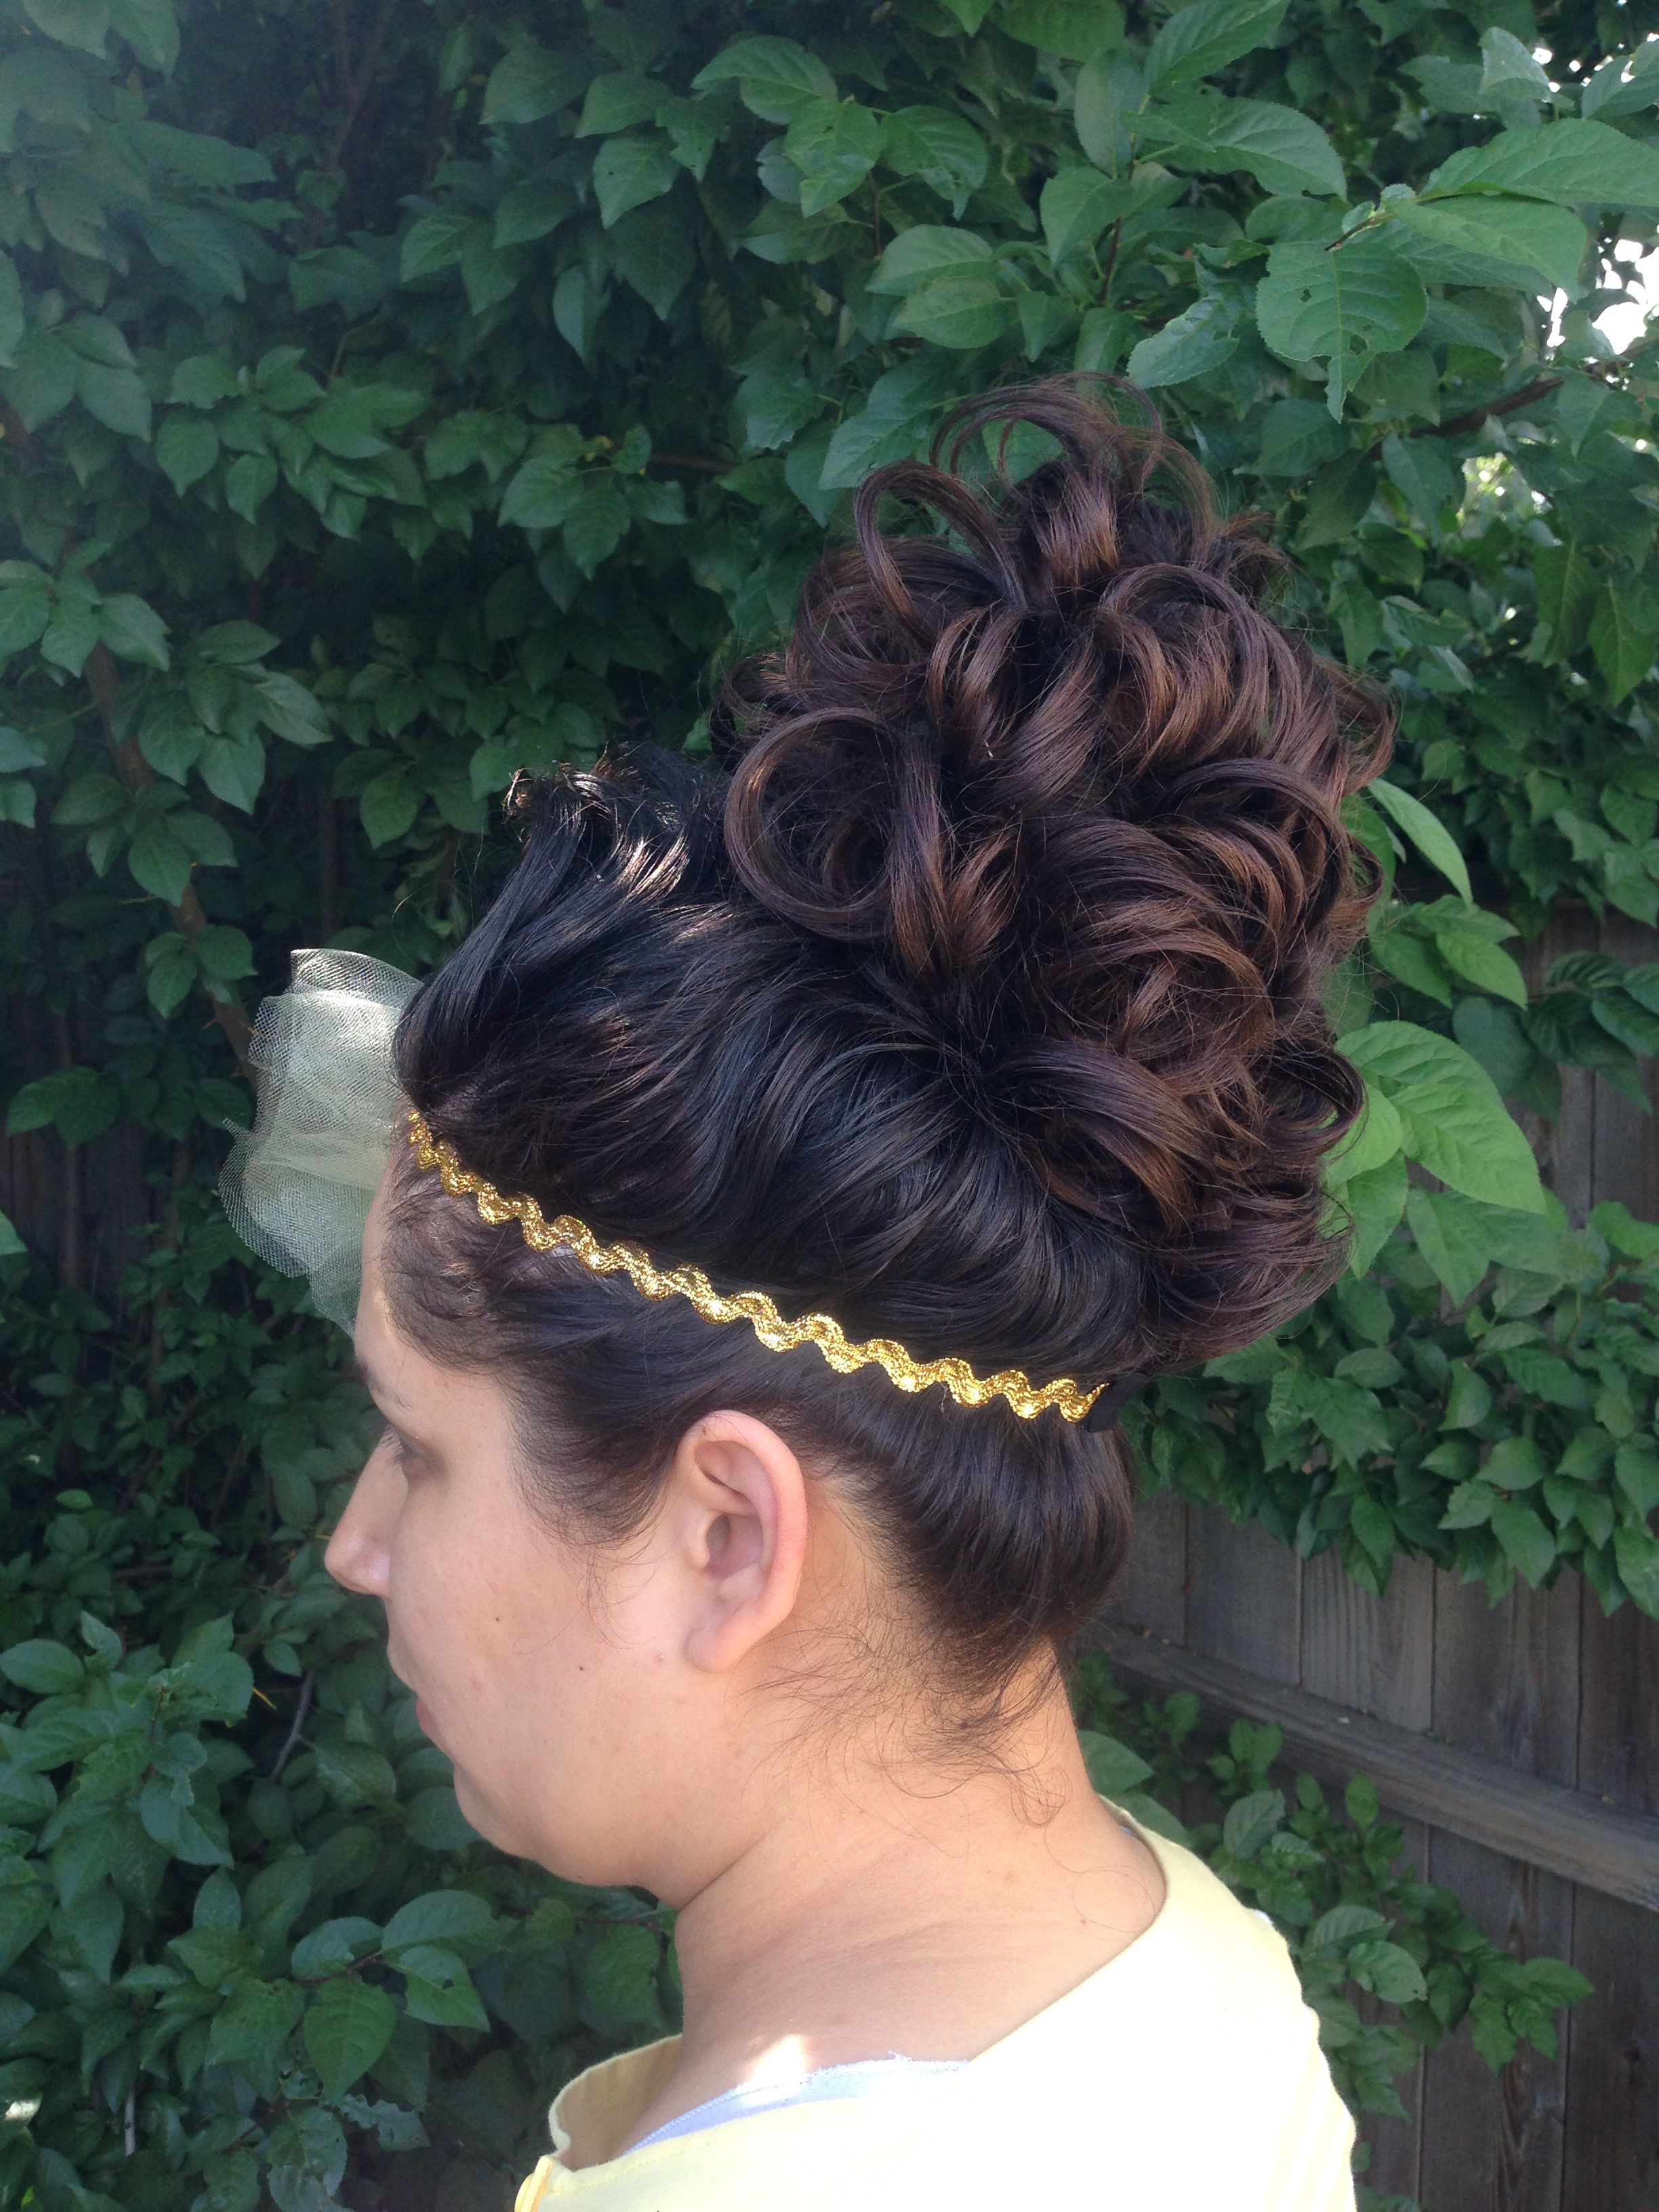 pentecostal hair #wedding #updo